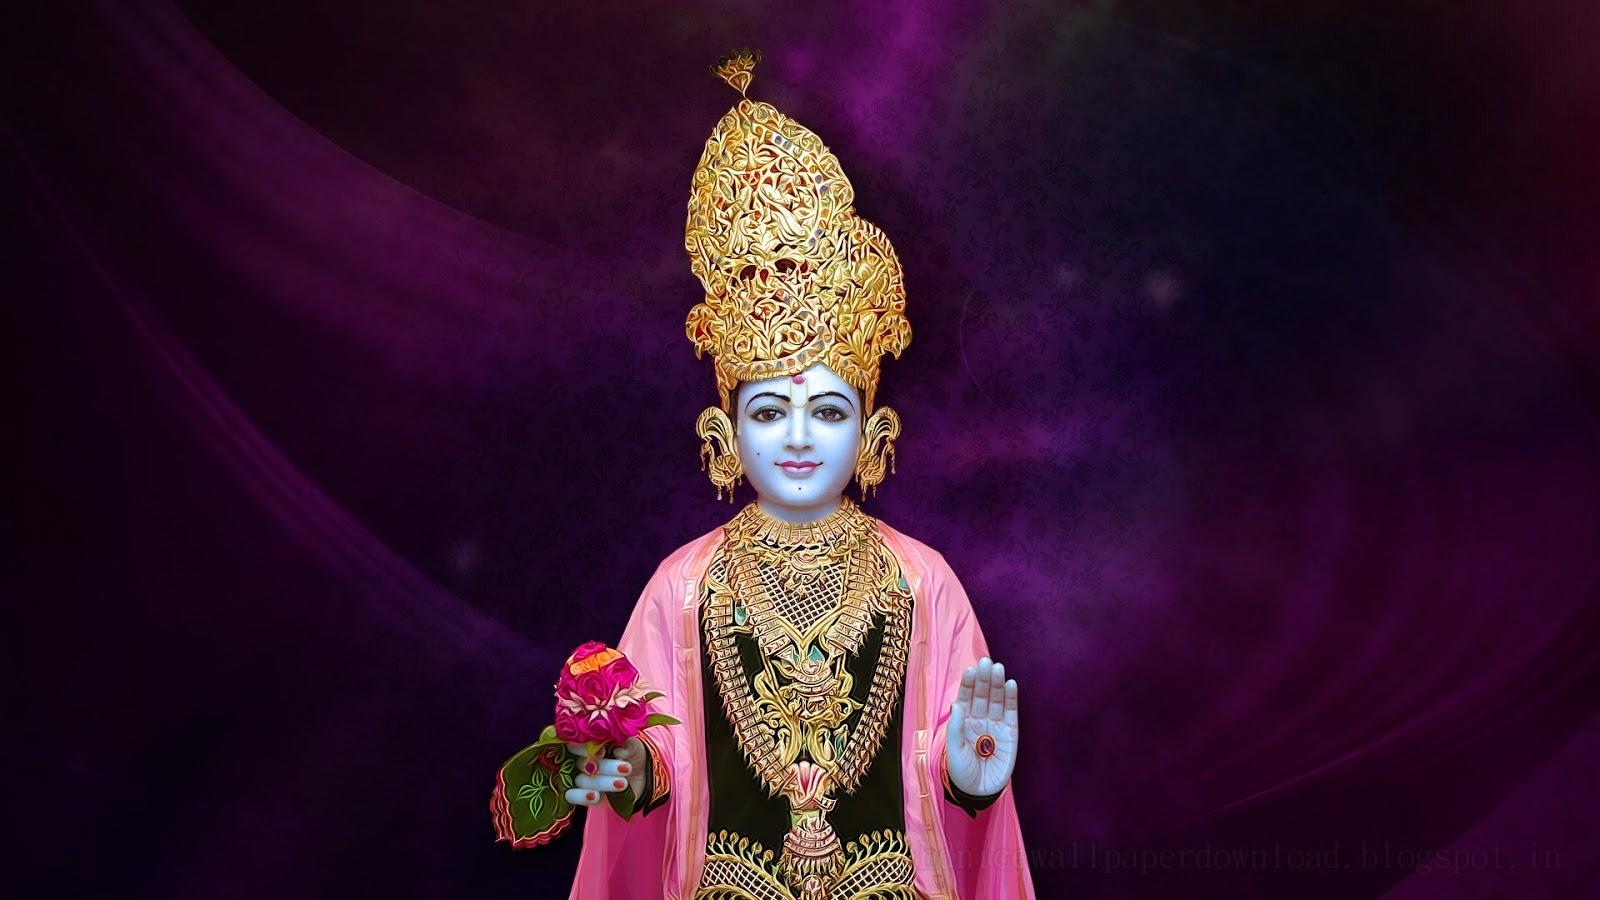 Baps Ghanshyam Maharaj Hd Wallpaper God Of Swaminarayan Wallpapers Download Best Hd Wallpaper